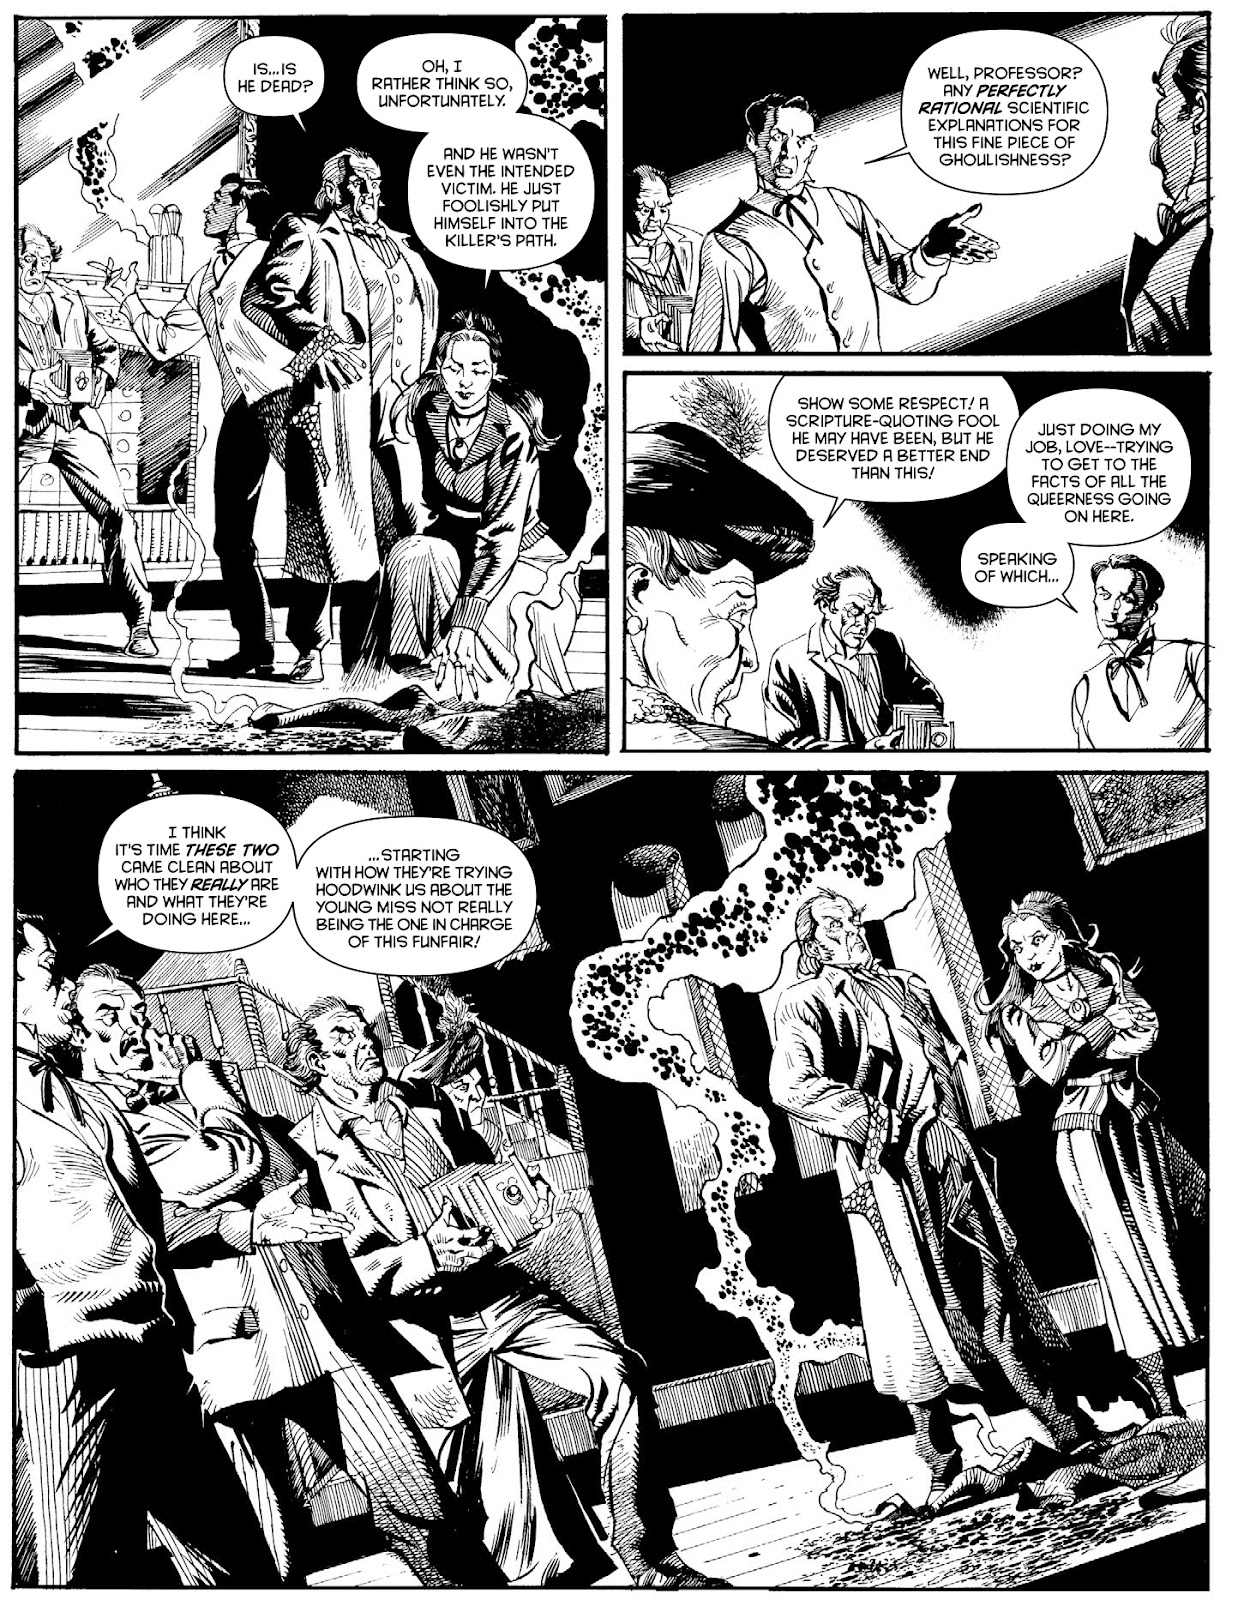 Judge Dredd Megazine (Vol. 5) issue 427 - Page 93